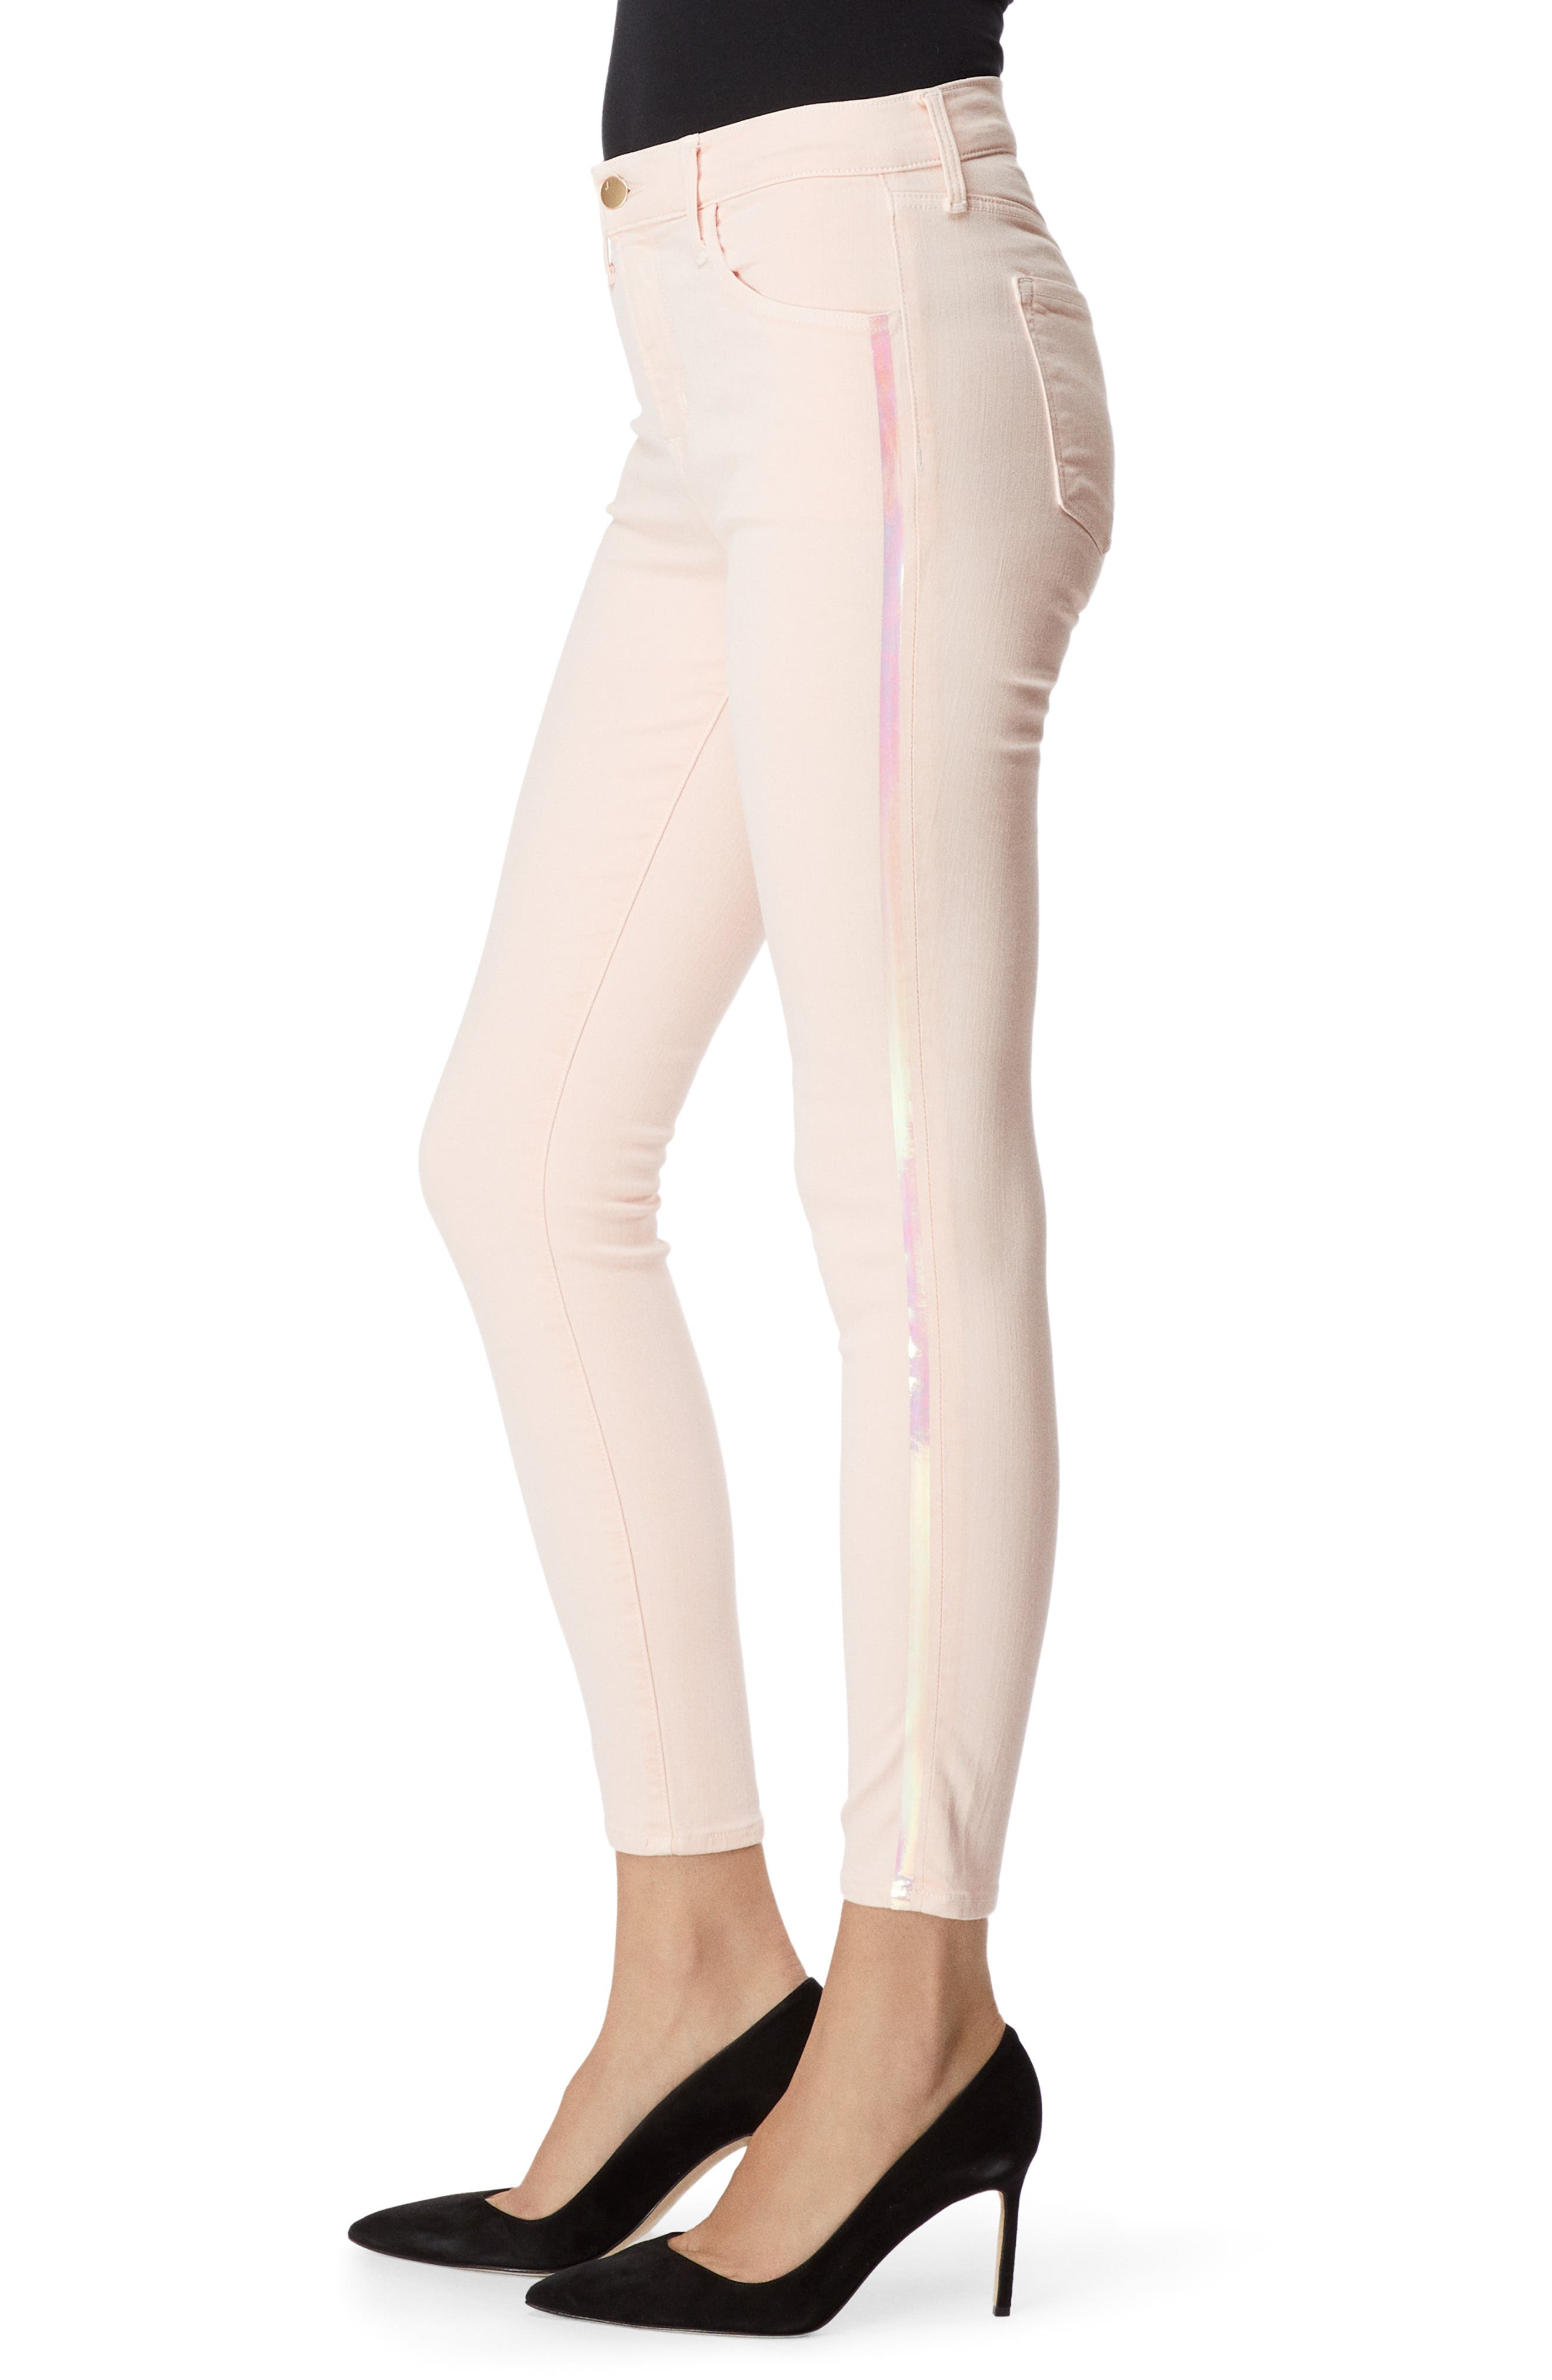 J BRAND, Alana High Waist Ankle Skinny Jeans, Alternate thumbnail 3, color, 684